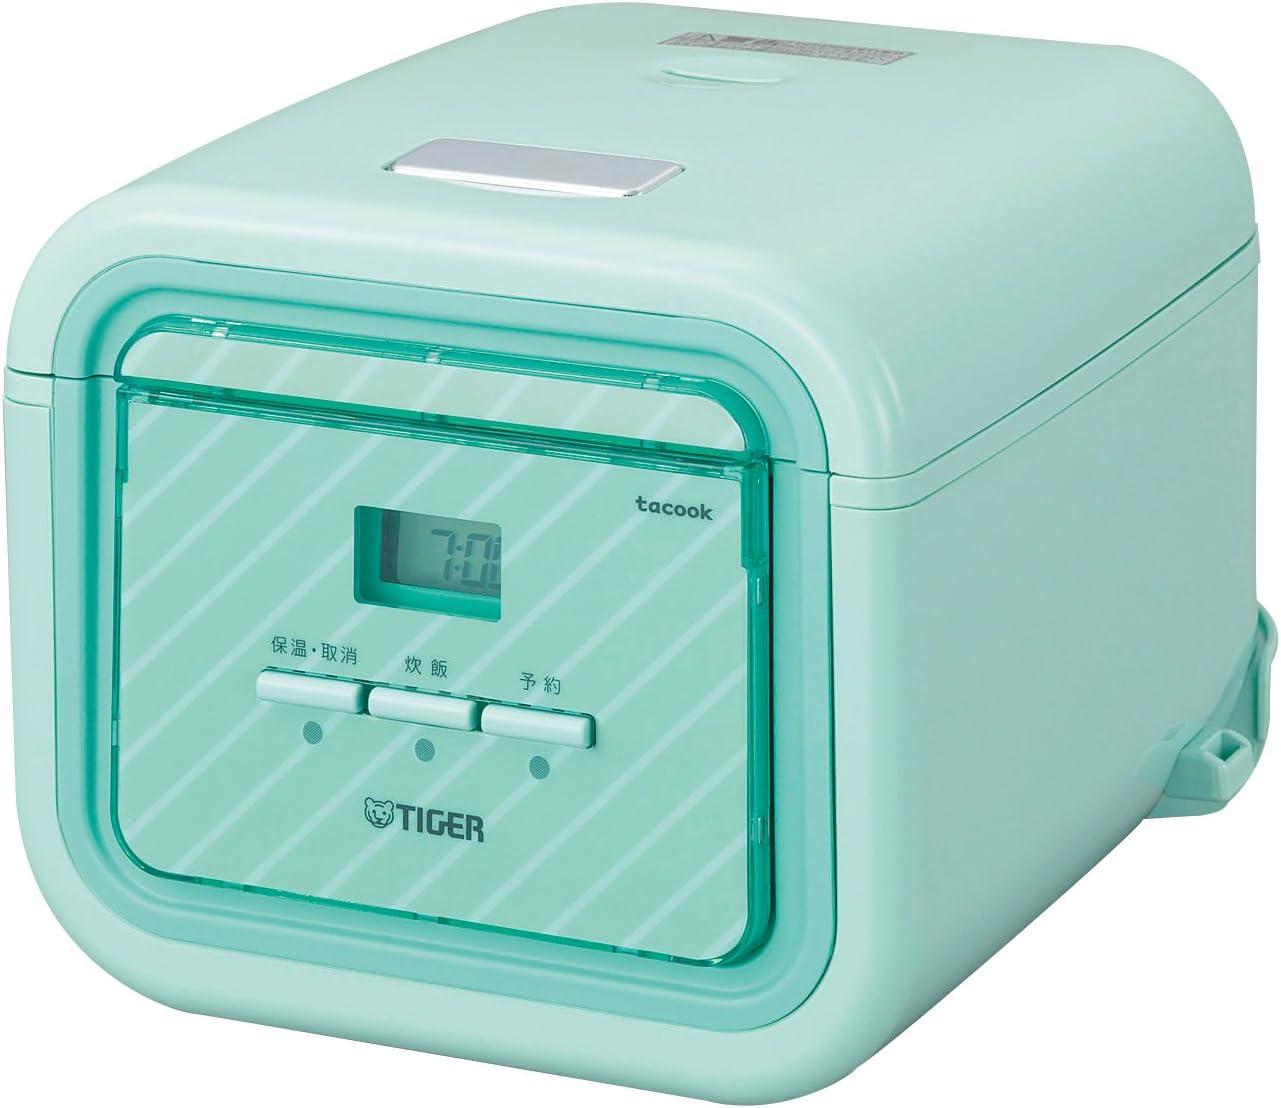 Tiger microcomputer rice cooker tacook JAJ-A552-GI JAJ-A552-GI